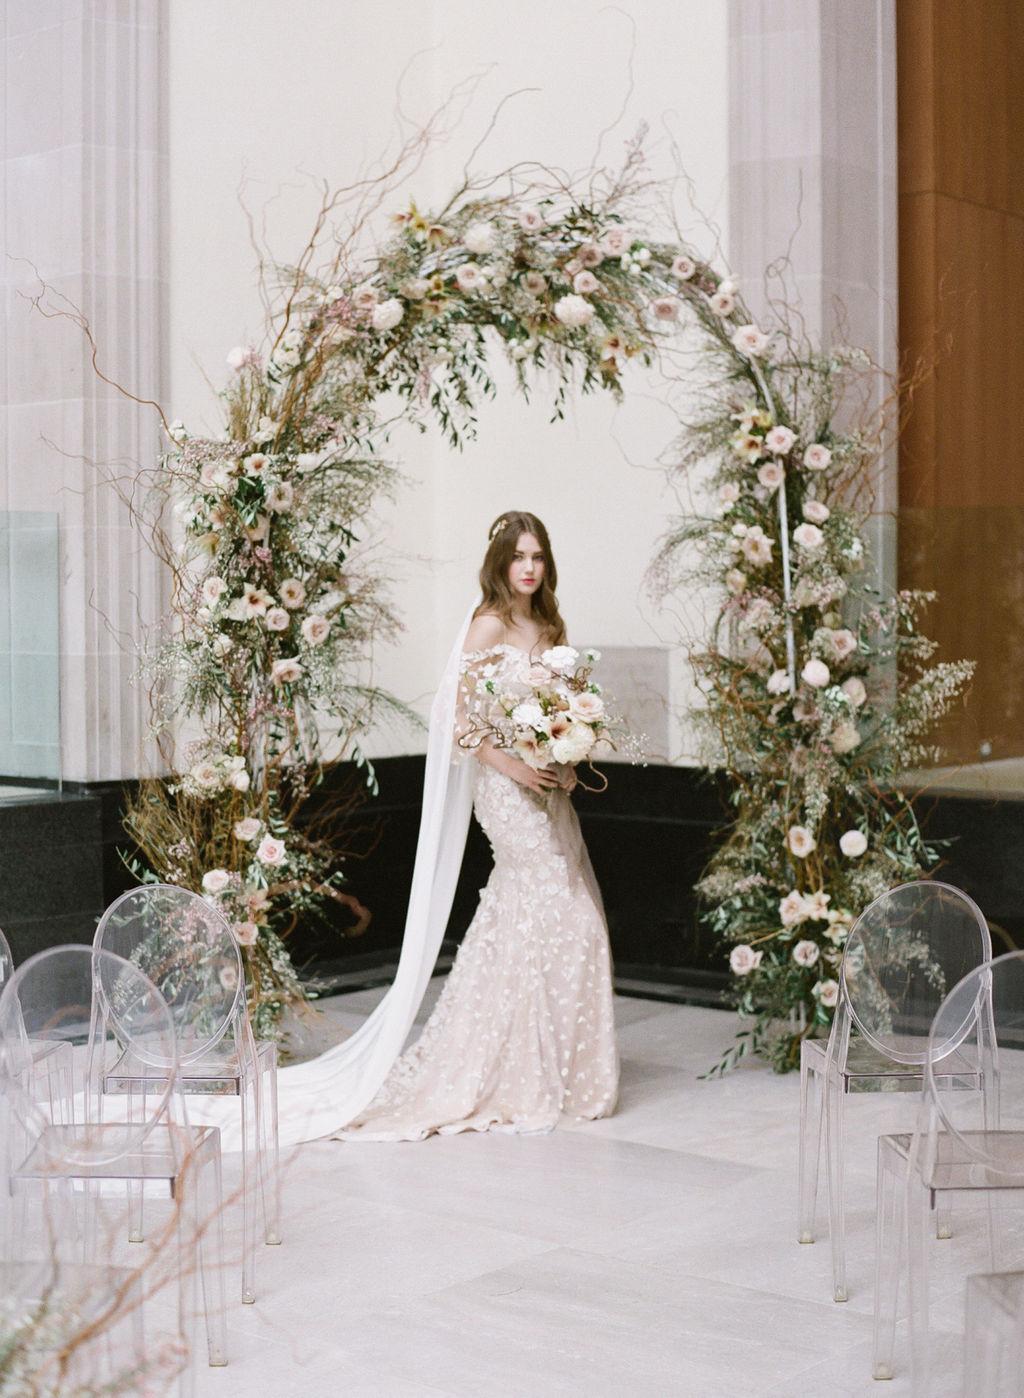 artiese-ago-wedding-editorial-000423590004.jpg